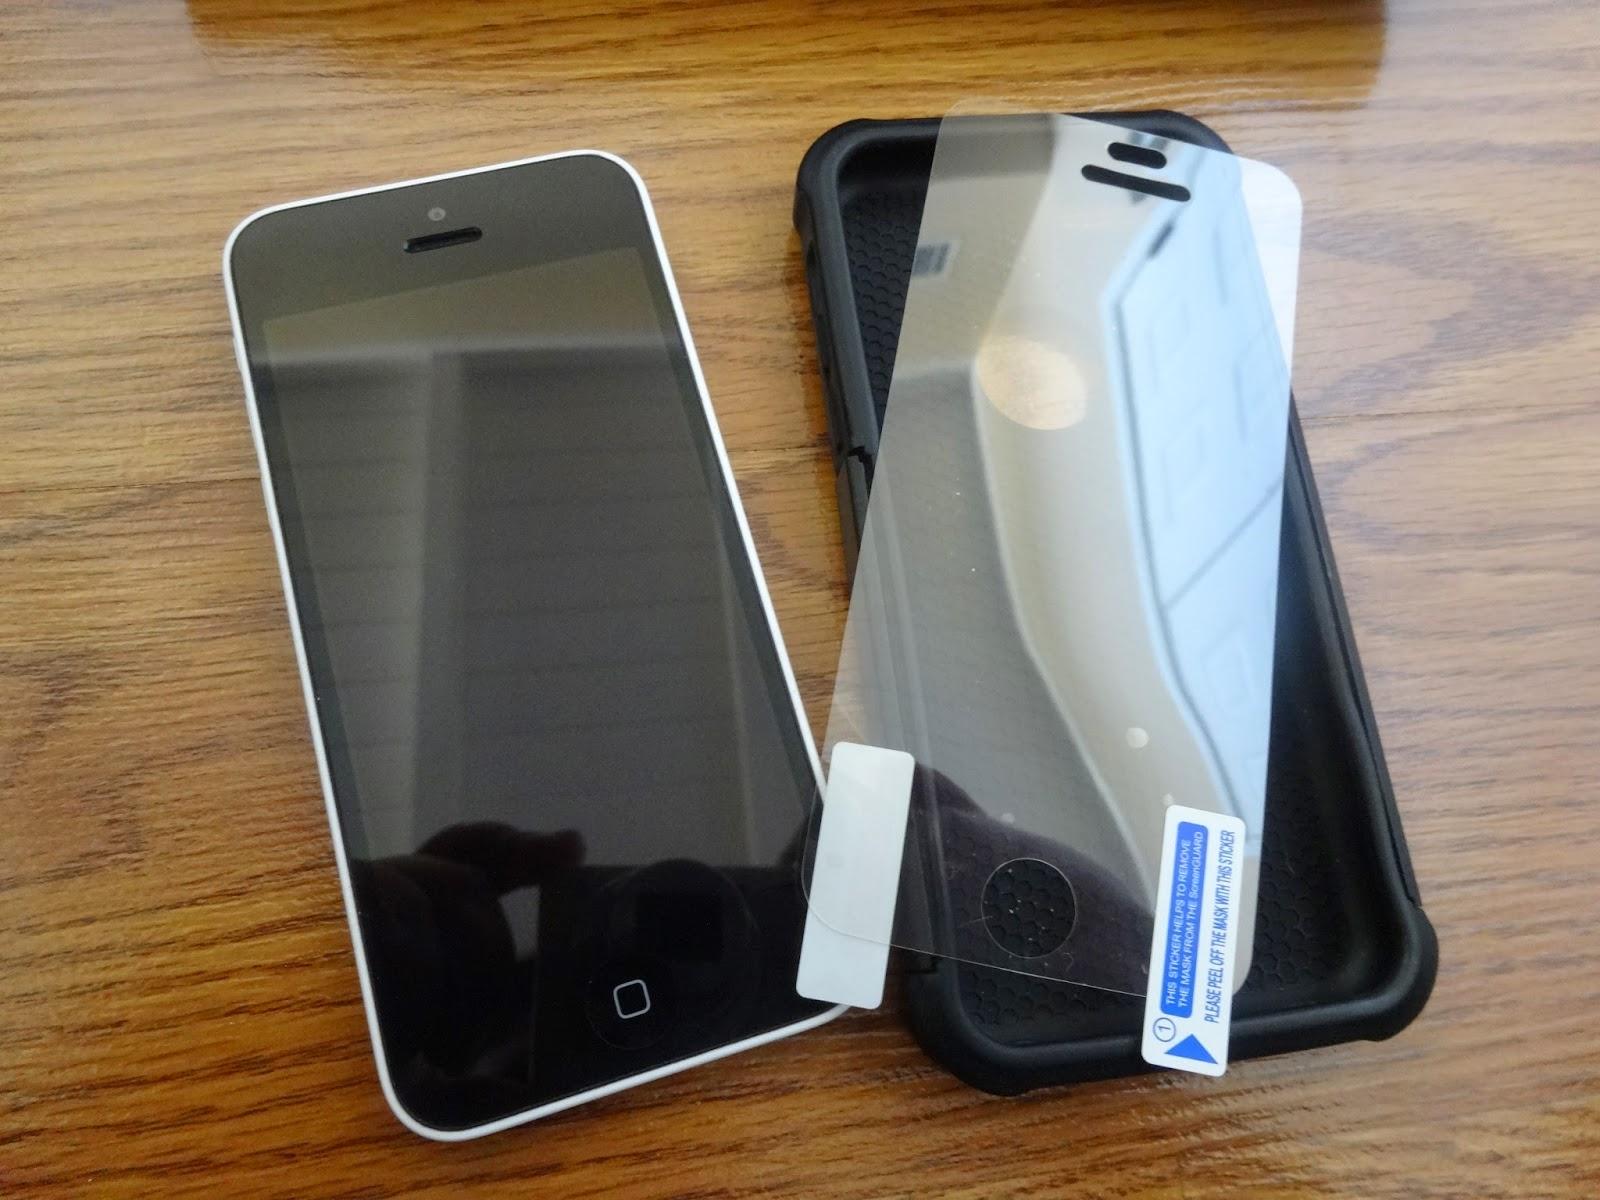 Køb iPhone 5 S